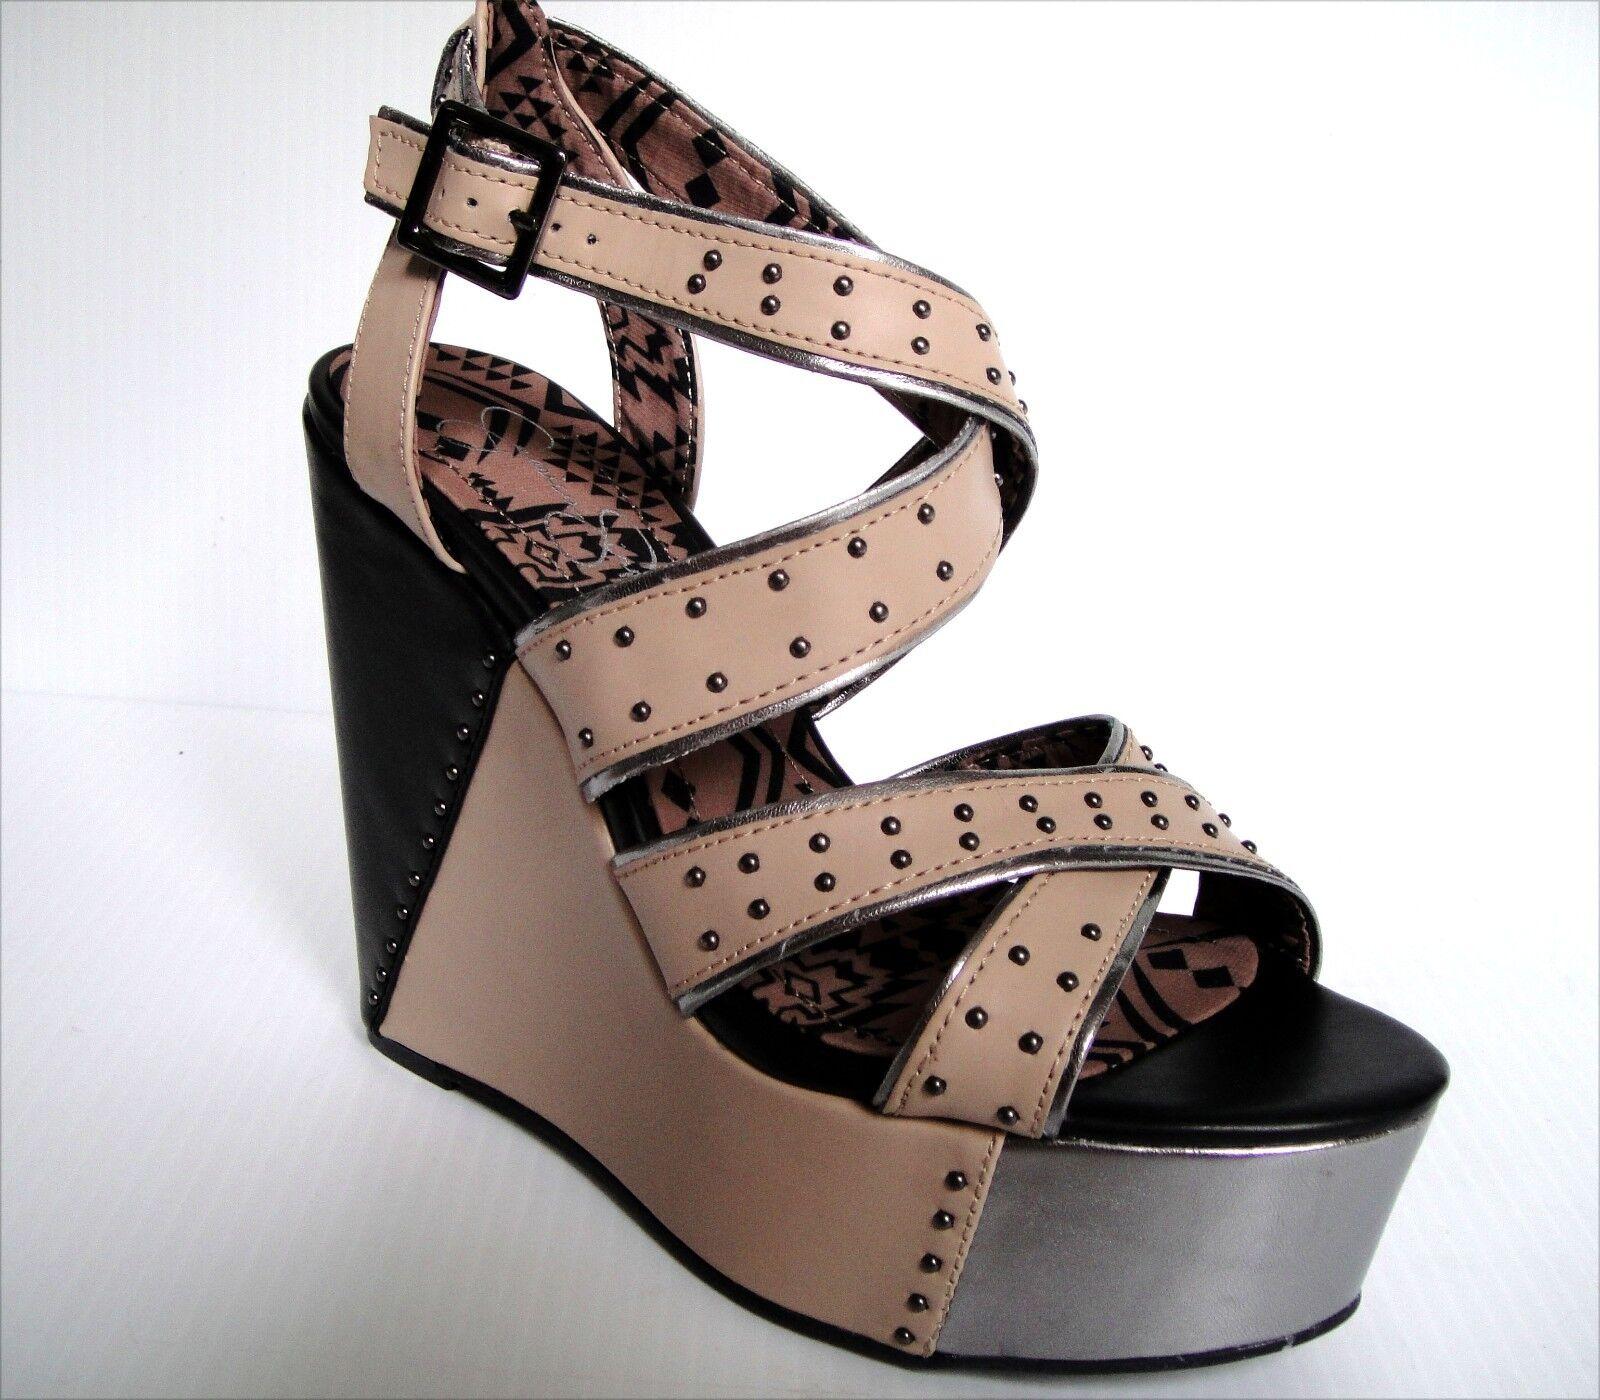 New Jessica Simpson Women's  Wedge  Sandal US size 8  Wedge EU 38 ecb5ad